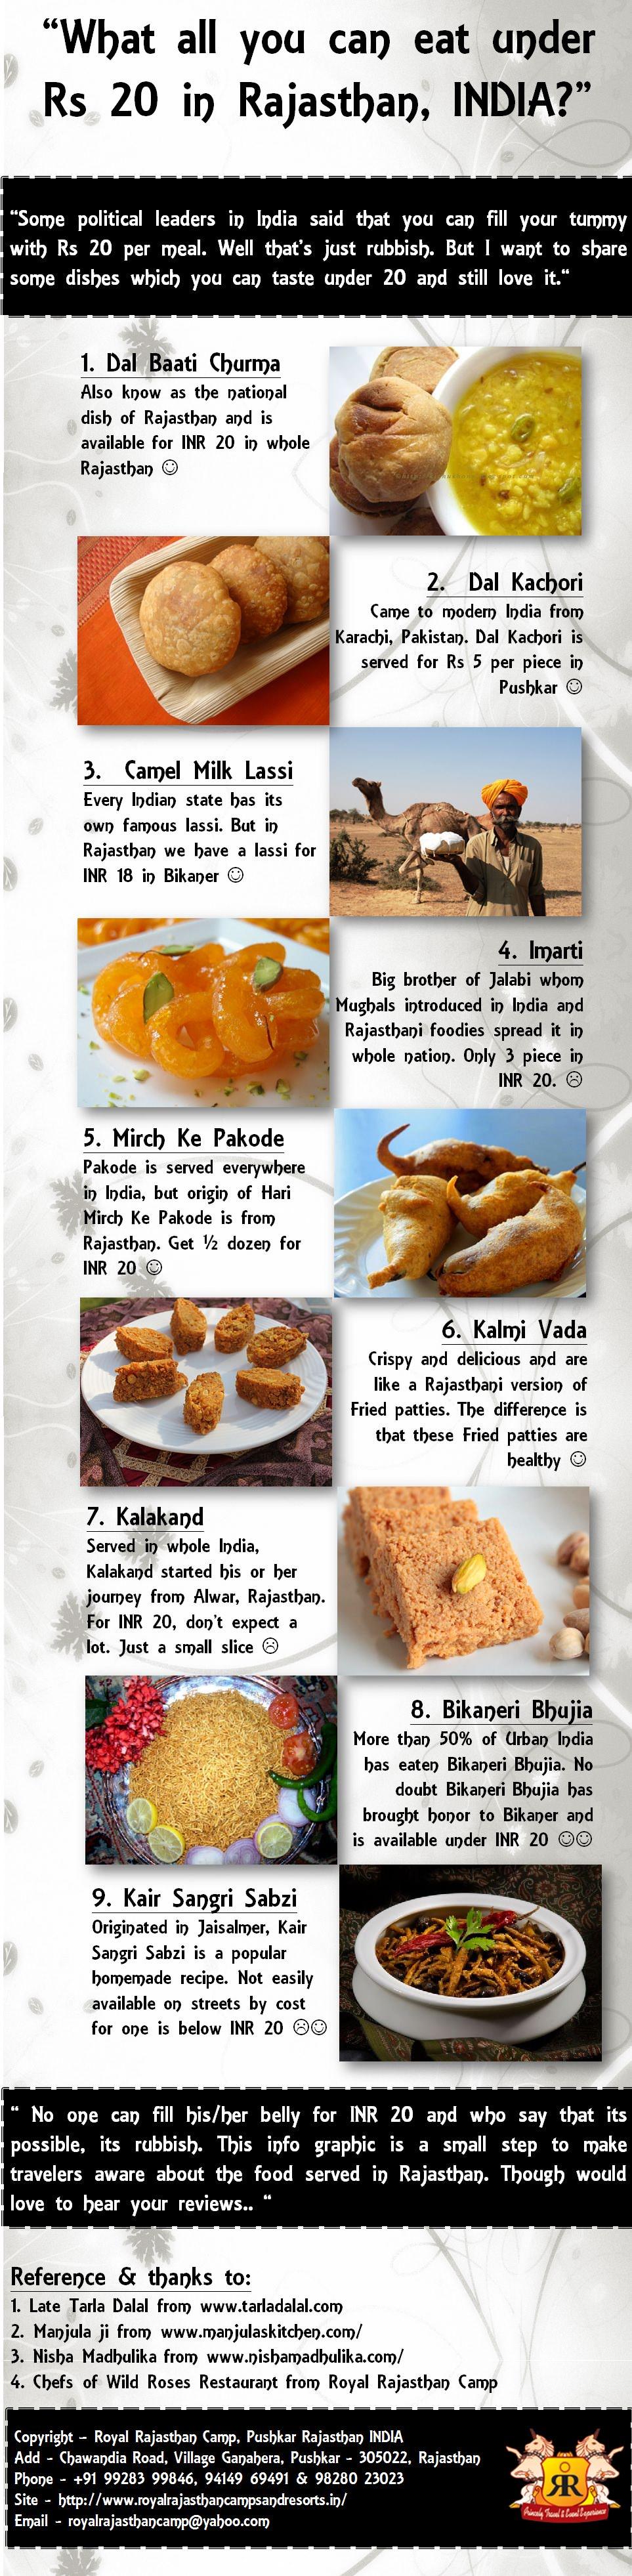 Infographic on Rajasthani food